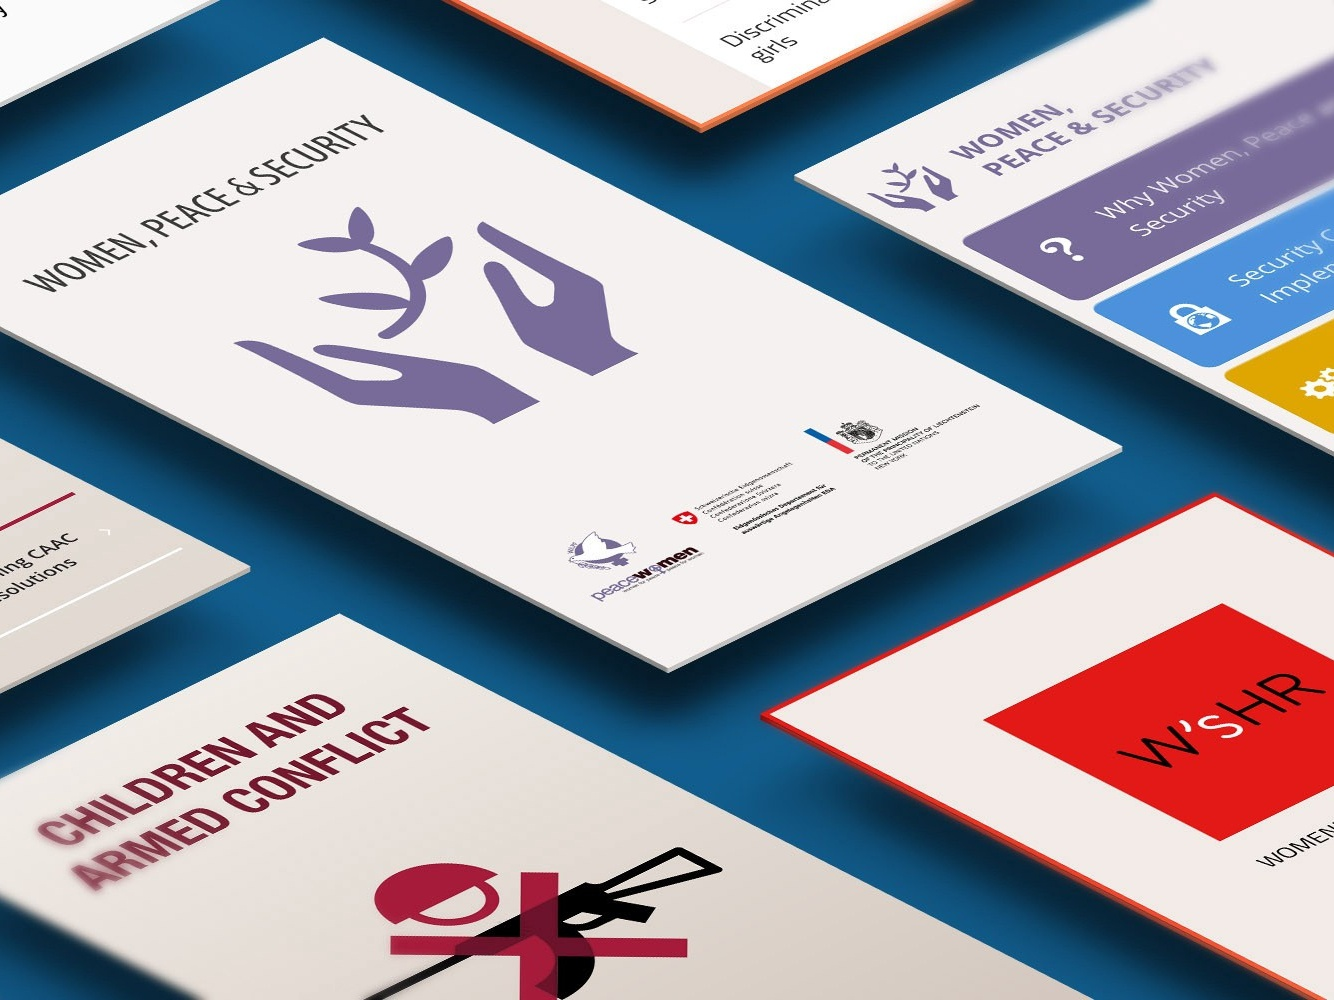 Humanitarian apps branding splash splash screen app design appstore apps app mockup women womens rights human rights